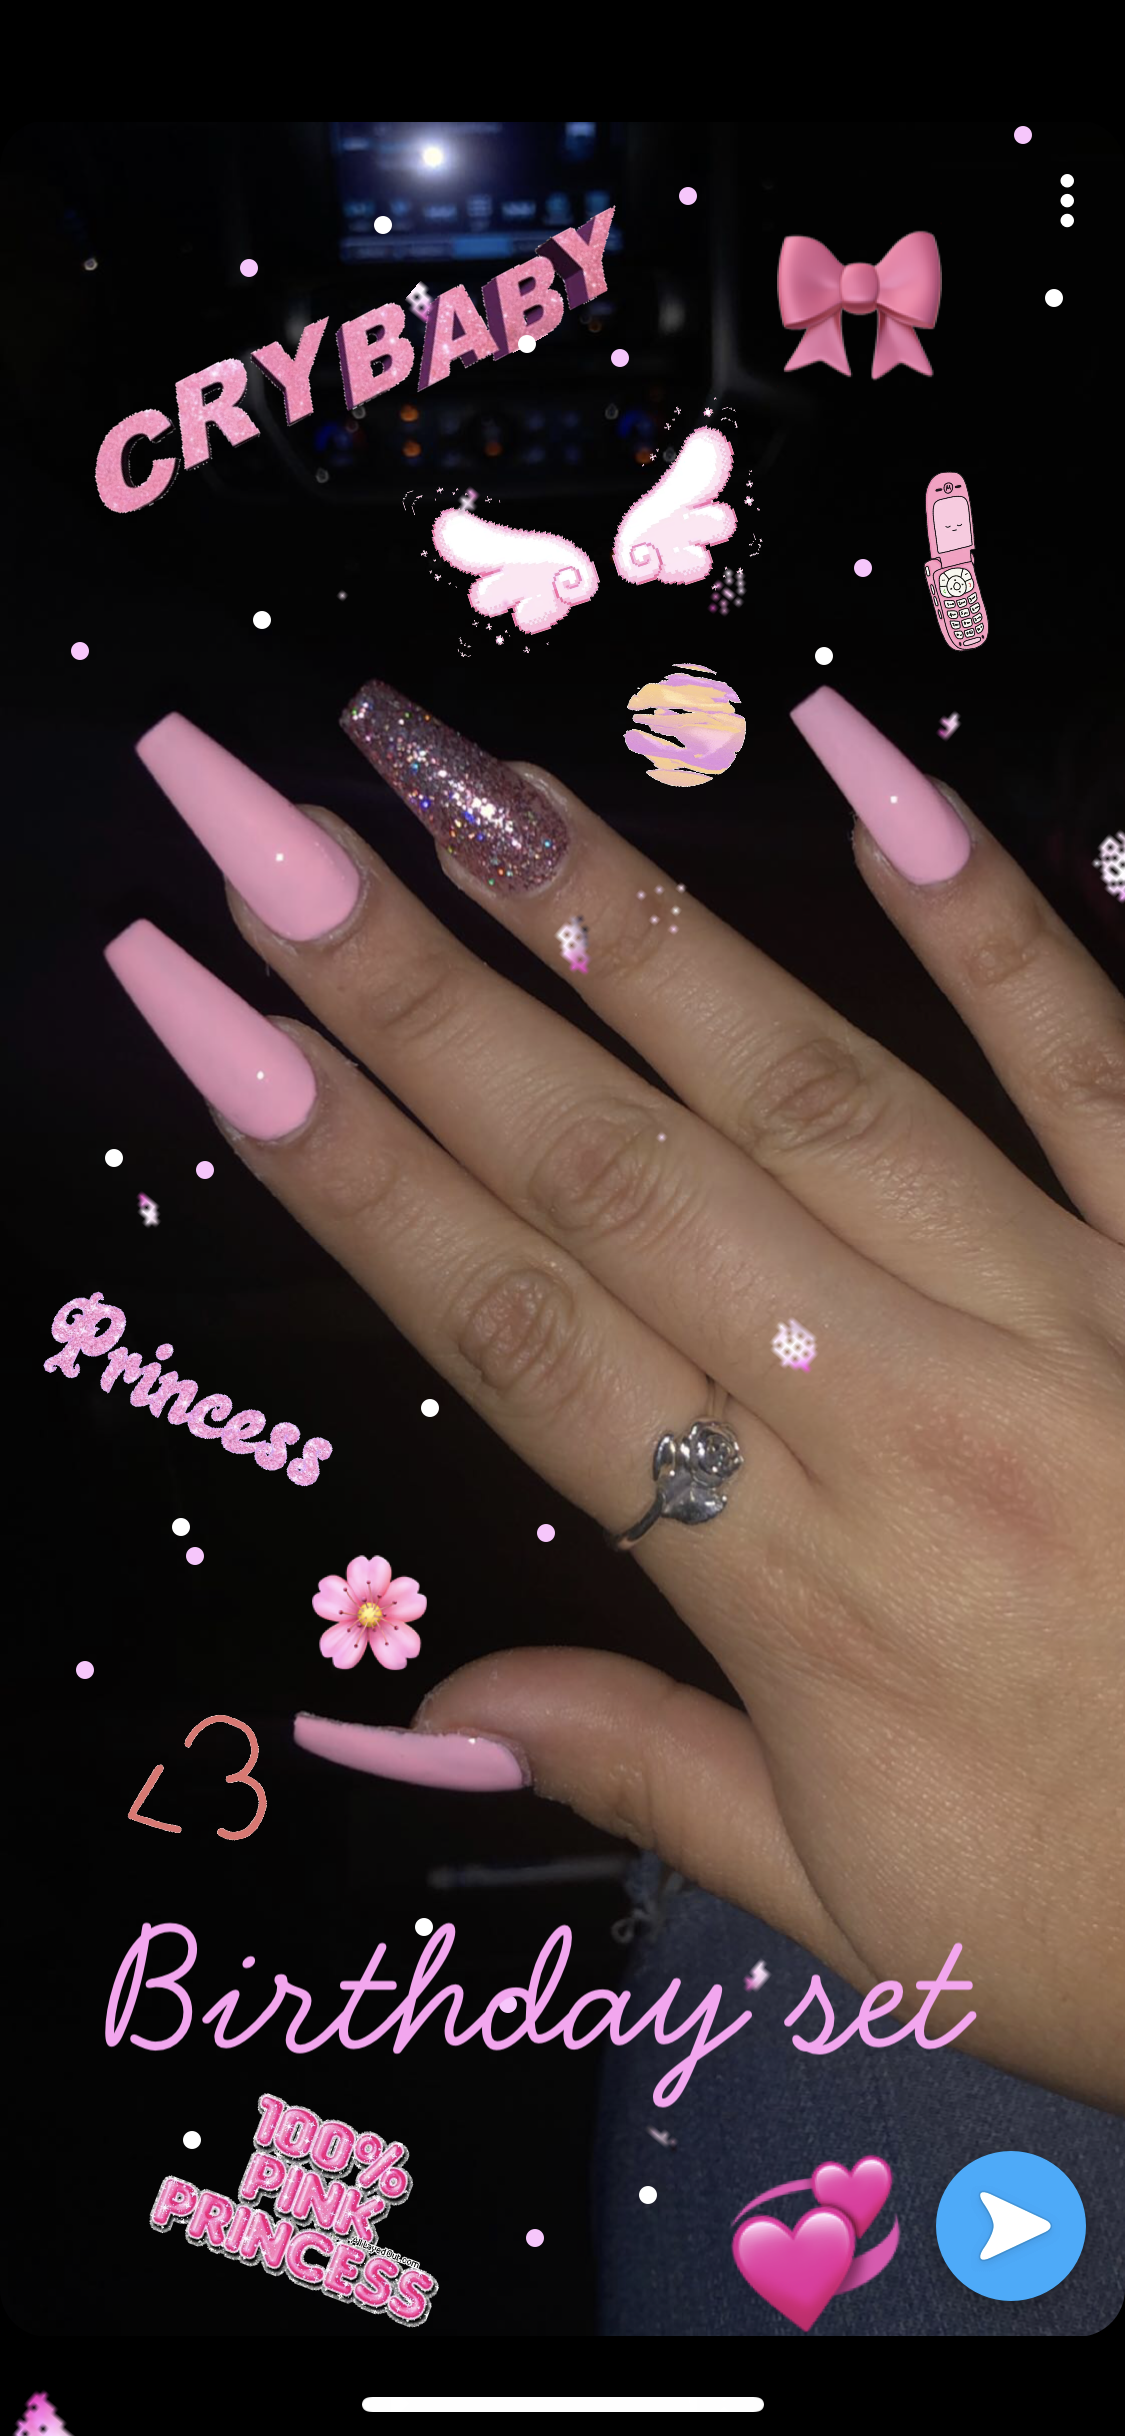 My 18th Birthday Set Pink Acrylic Nails Glitter Coffin Baddie Nailart Nailinspiratio In 2020 Acrylic Nails Coffin Pink Pink Acrylic Nails Best Acrylic Nails